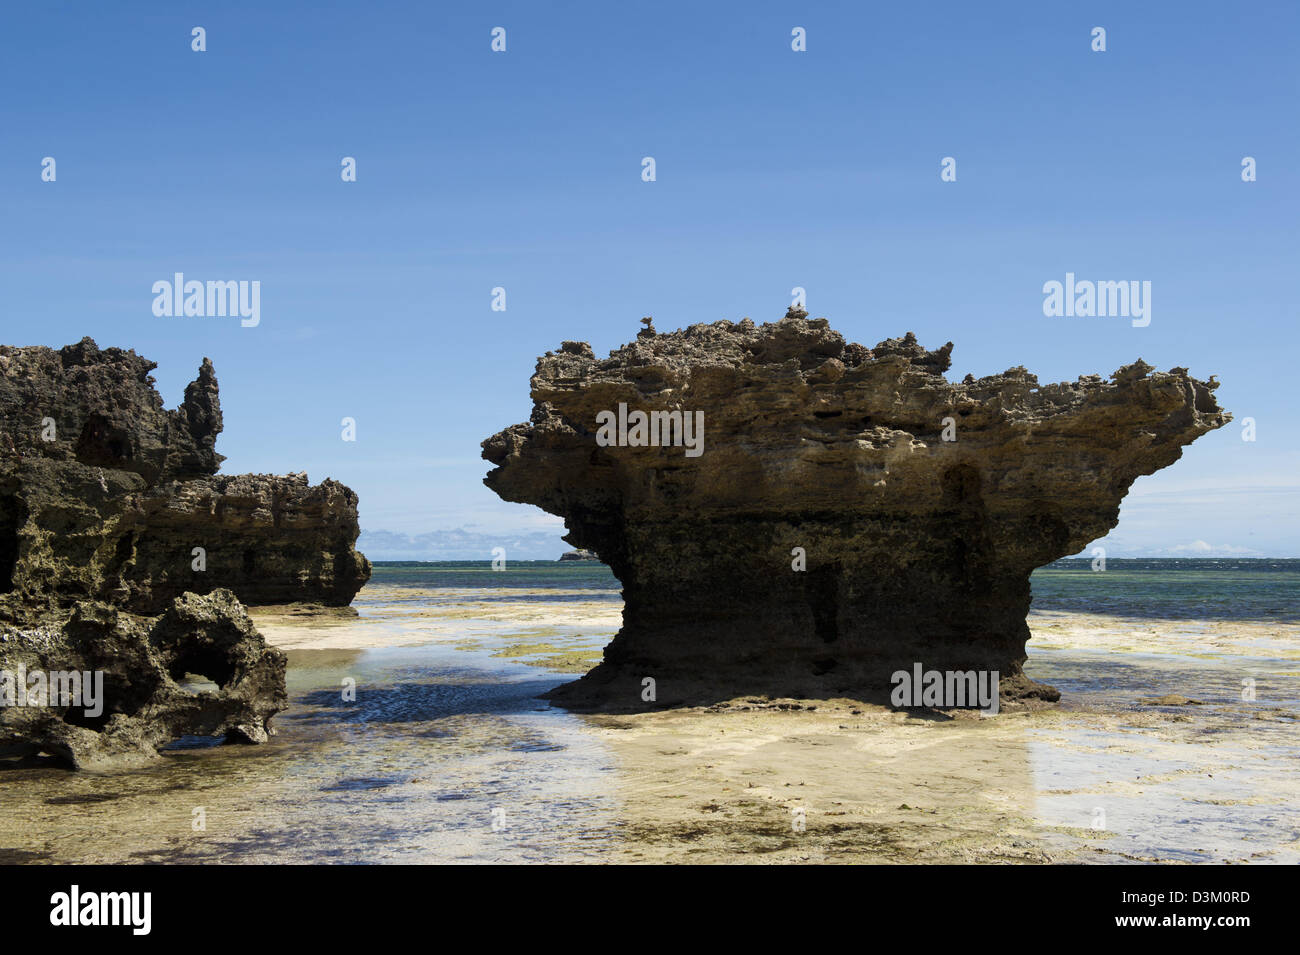 Coral outrcrop, Turtle Bay, Watamu, Kenya - Stock Image